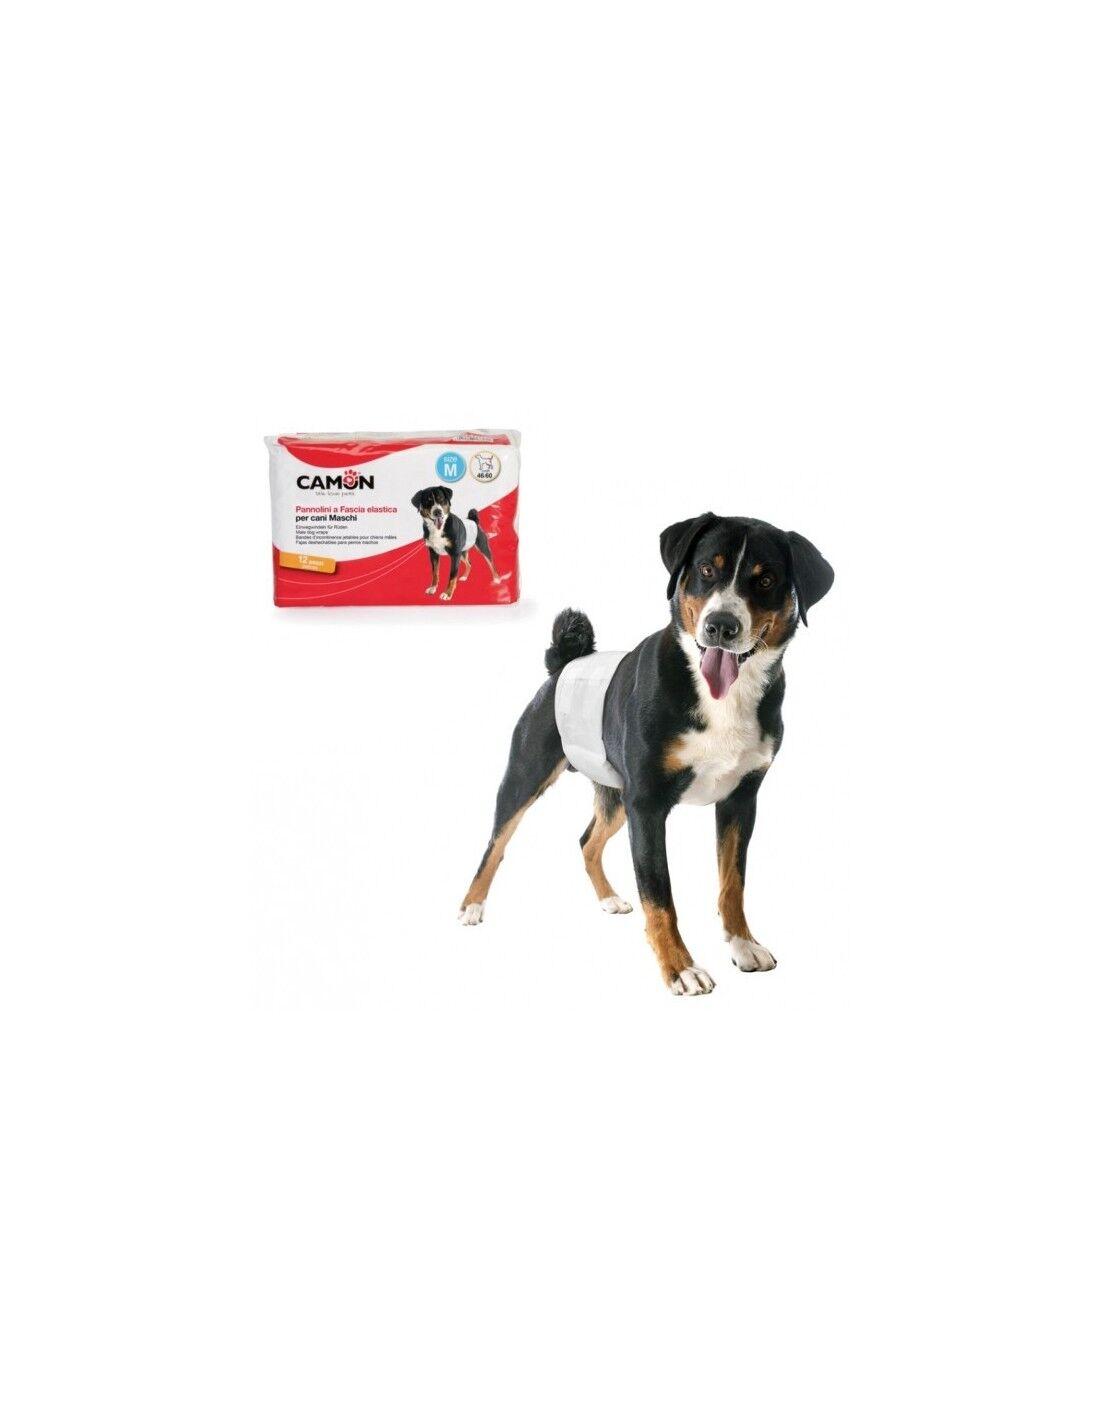 camon pannolini a fascia elastica per cani maschi diam. 60/80cm 12 pezzi taglia l